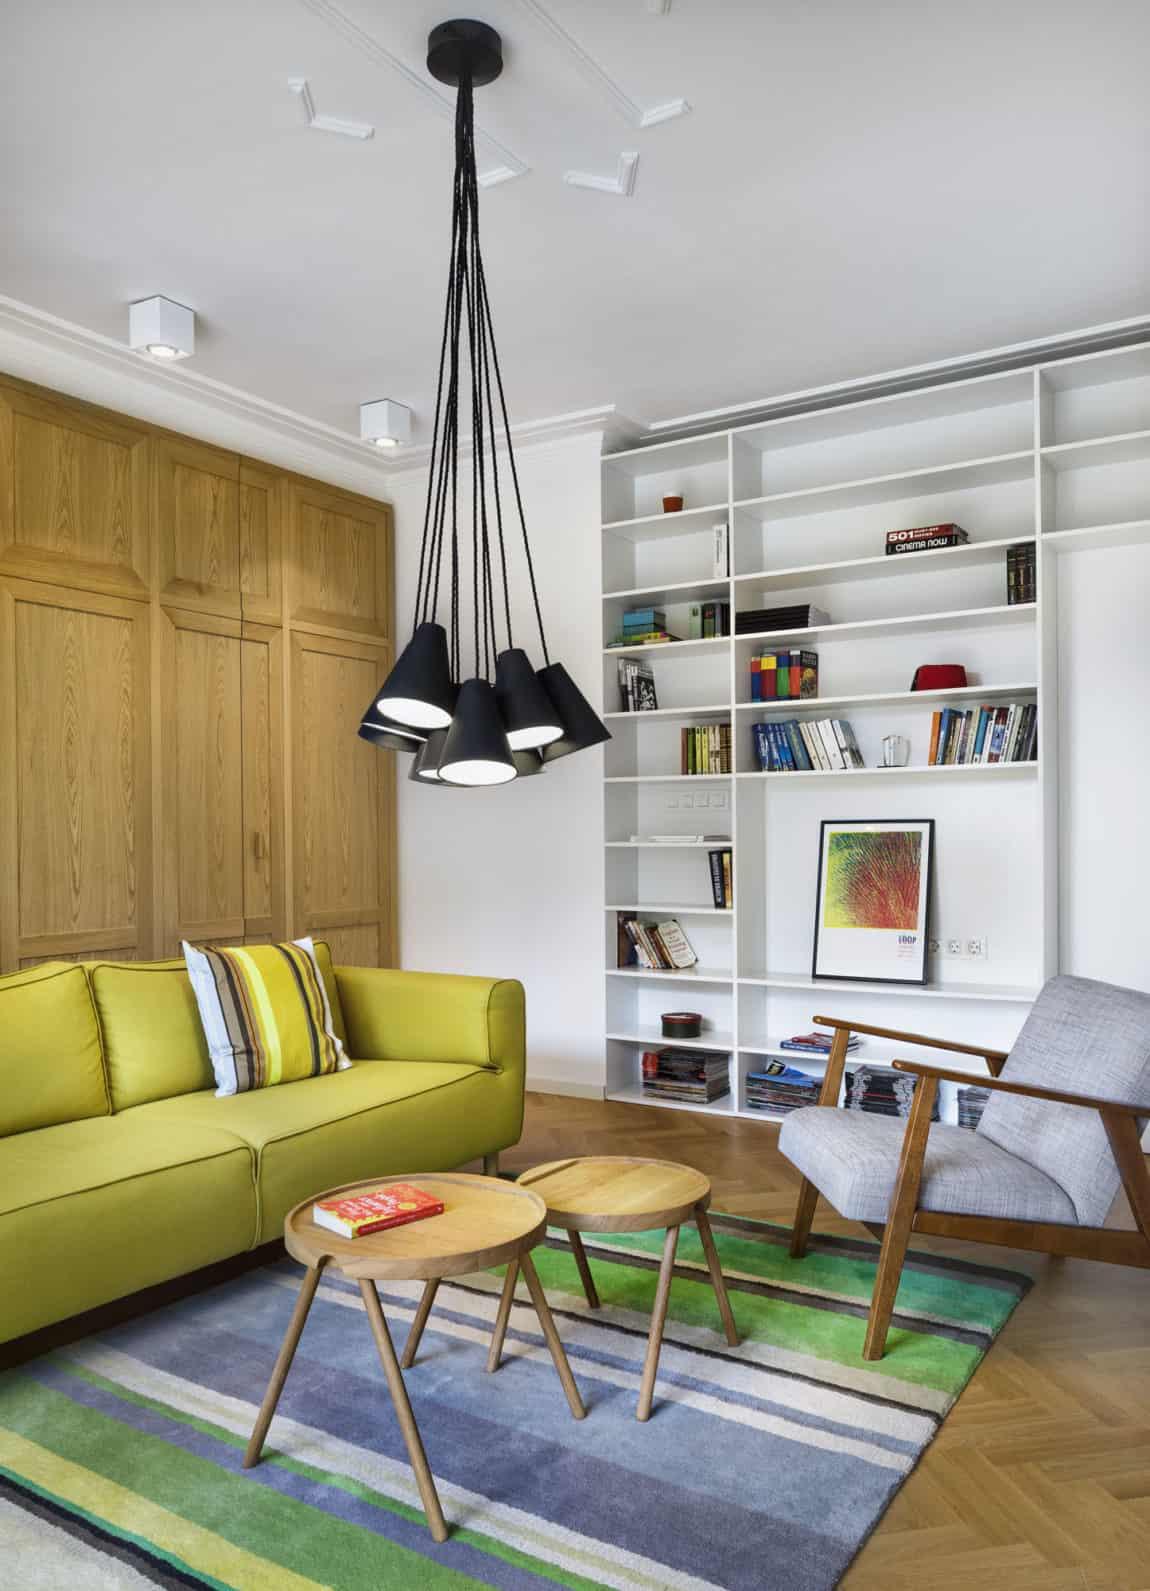 Apartment H01 by Dontdiystudio (5)